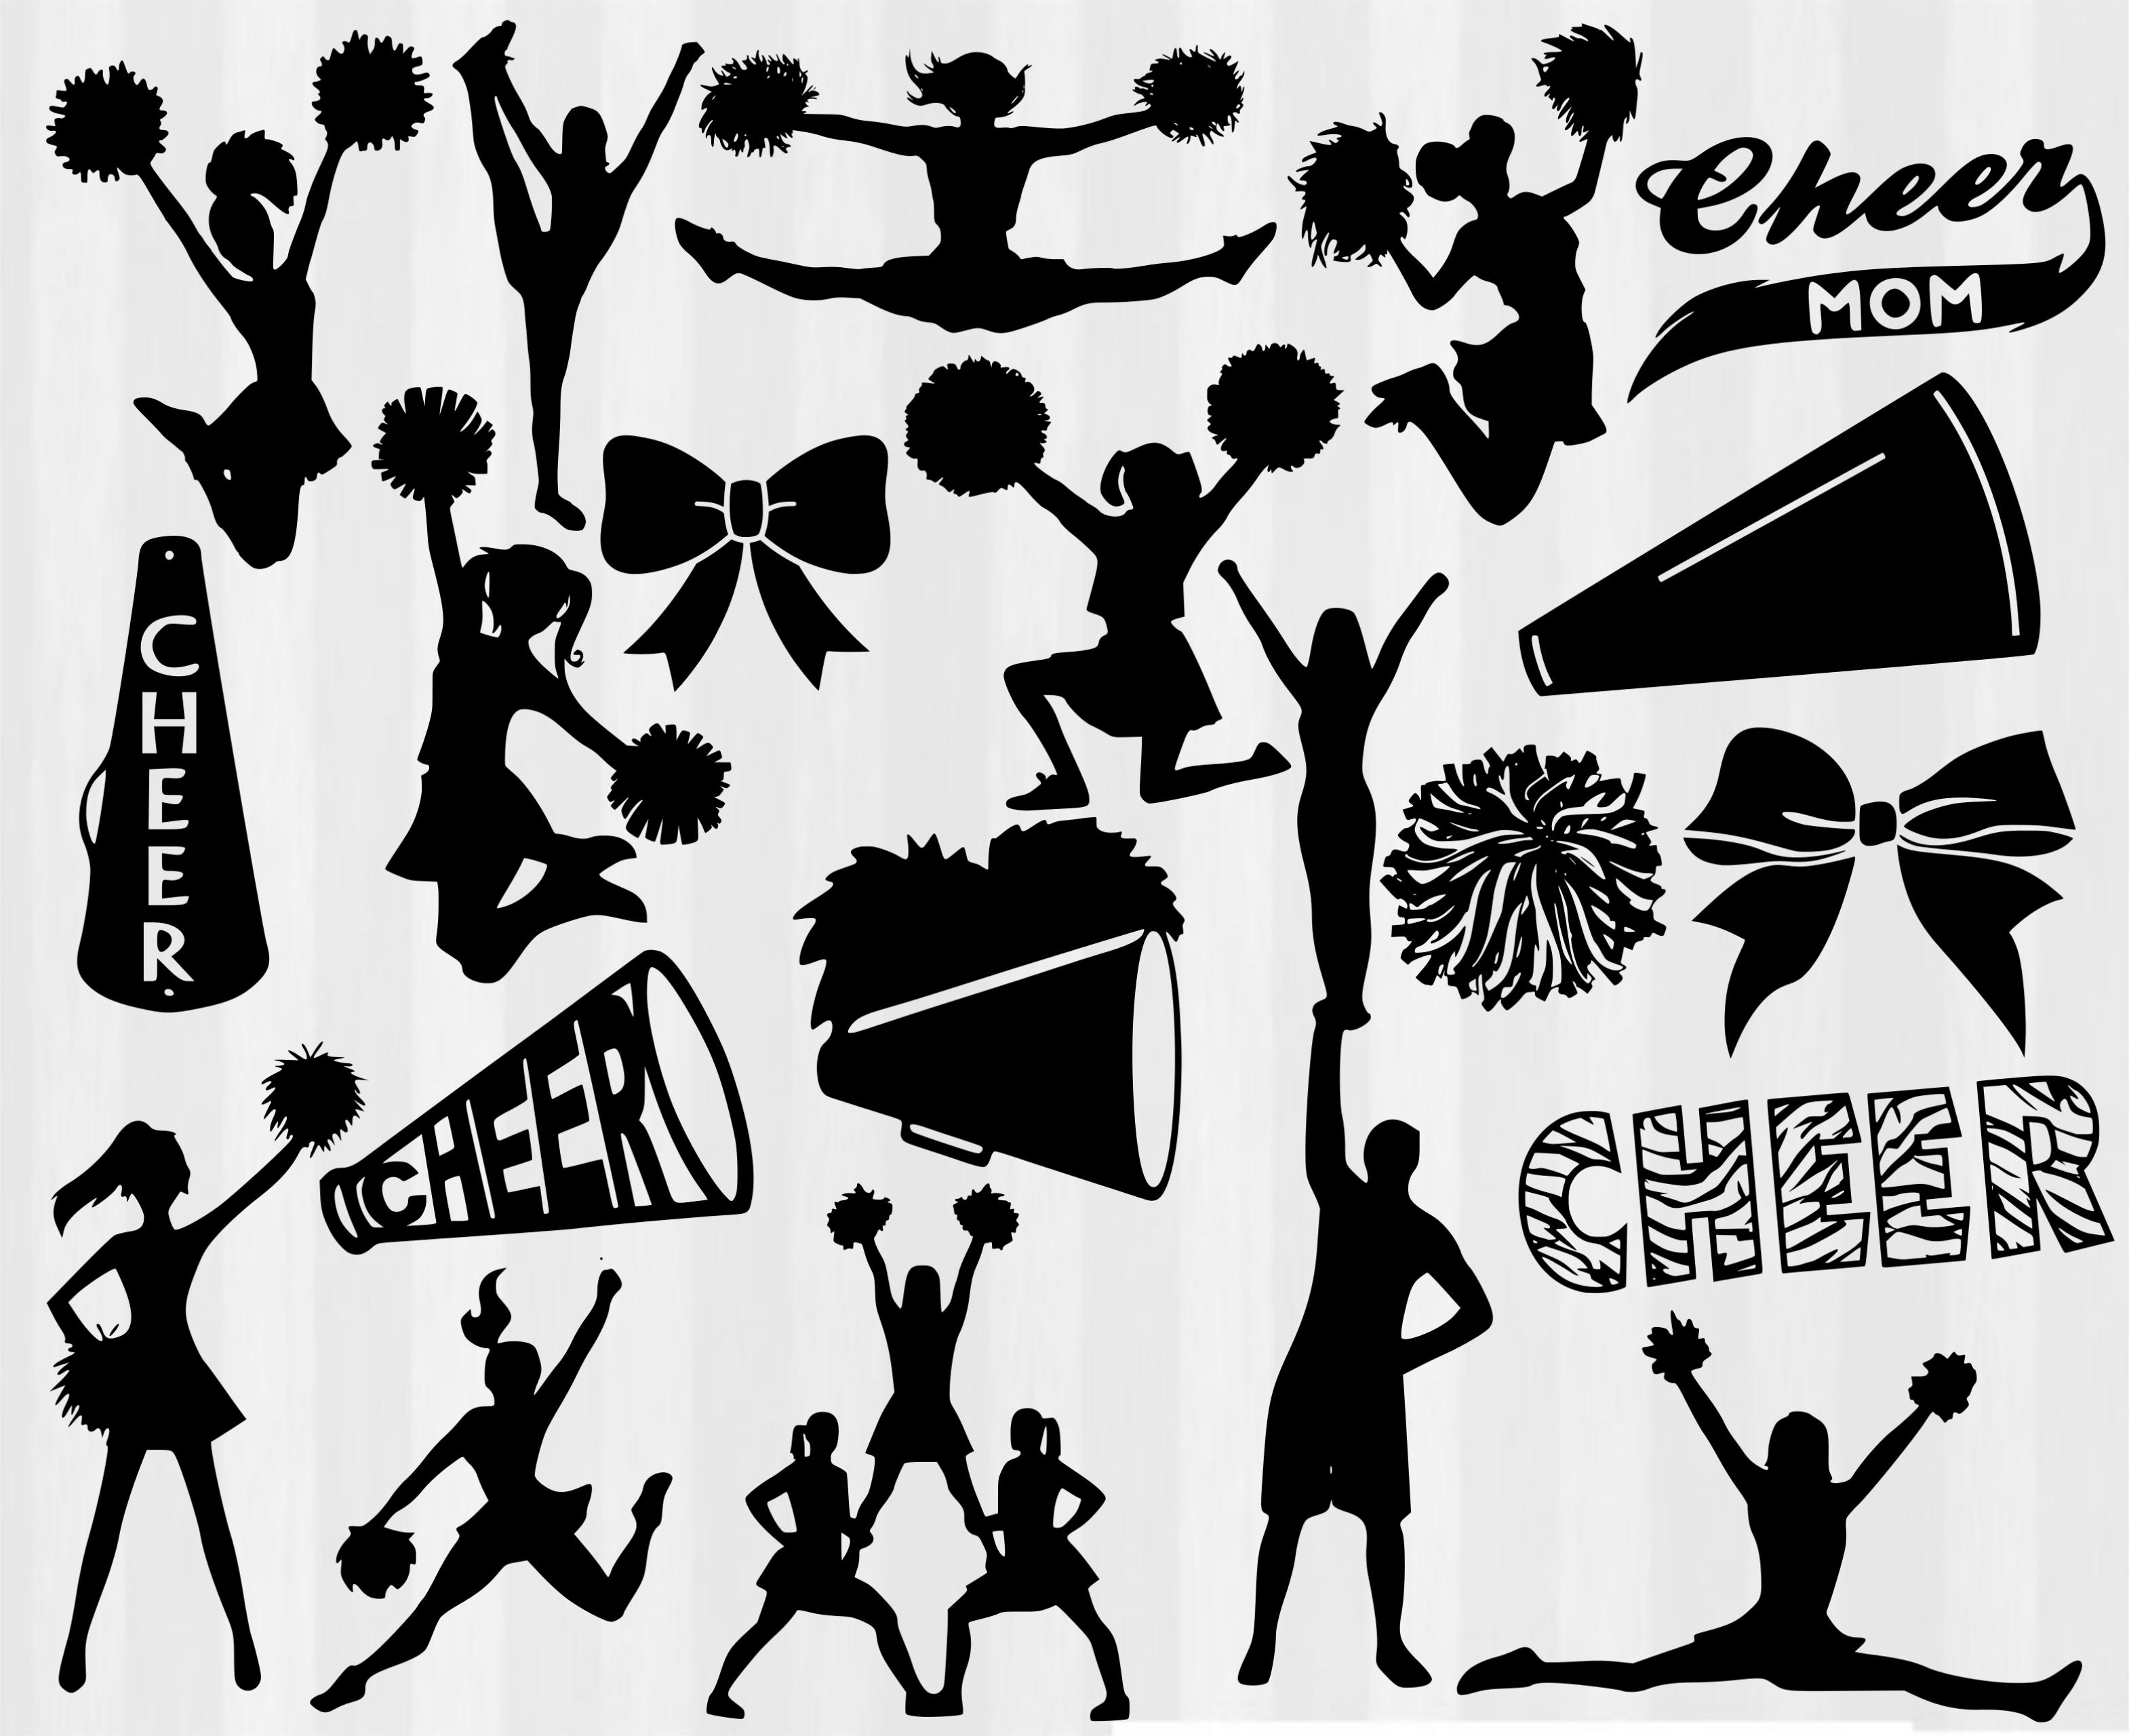 Cdd315b541373367d50129e258690486 Png 3 140 2 560 Pixels Cheer Clipart Silhouette Clip Art Cheer Mom